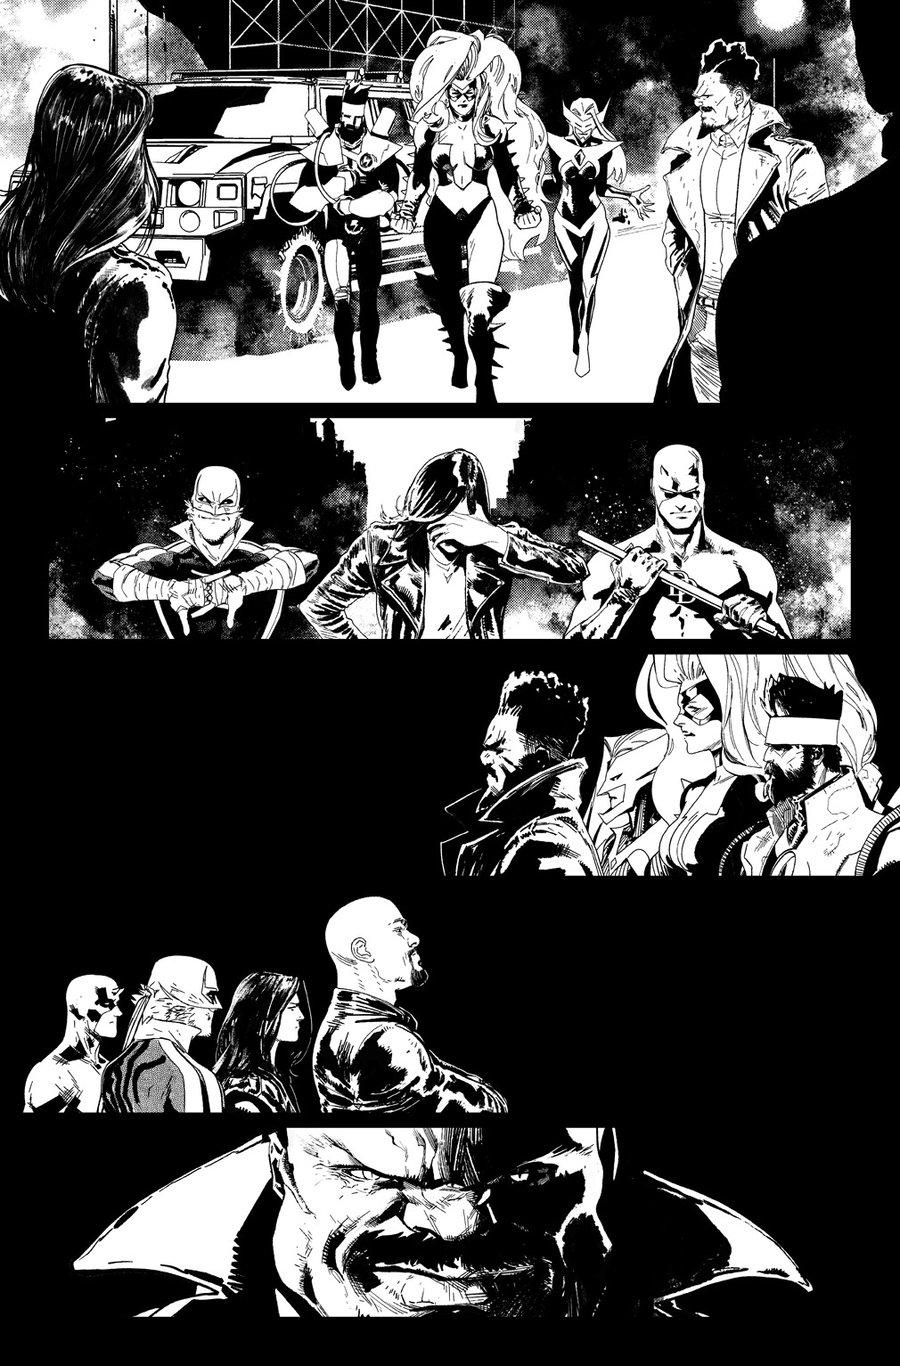 Image of DEFENDERS #9, p.08 ARTIST'S PROOF